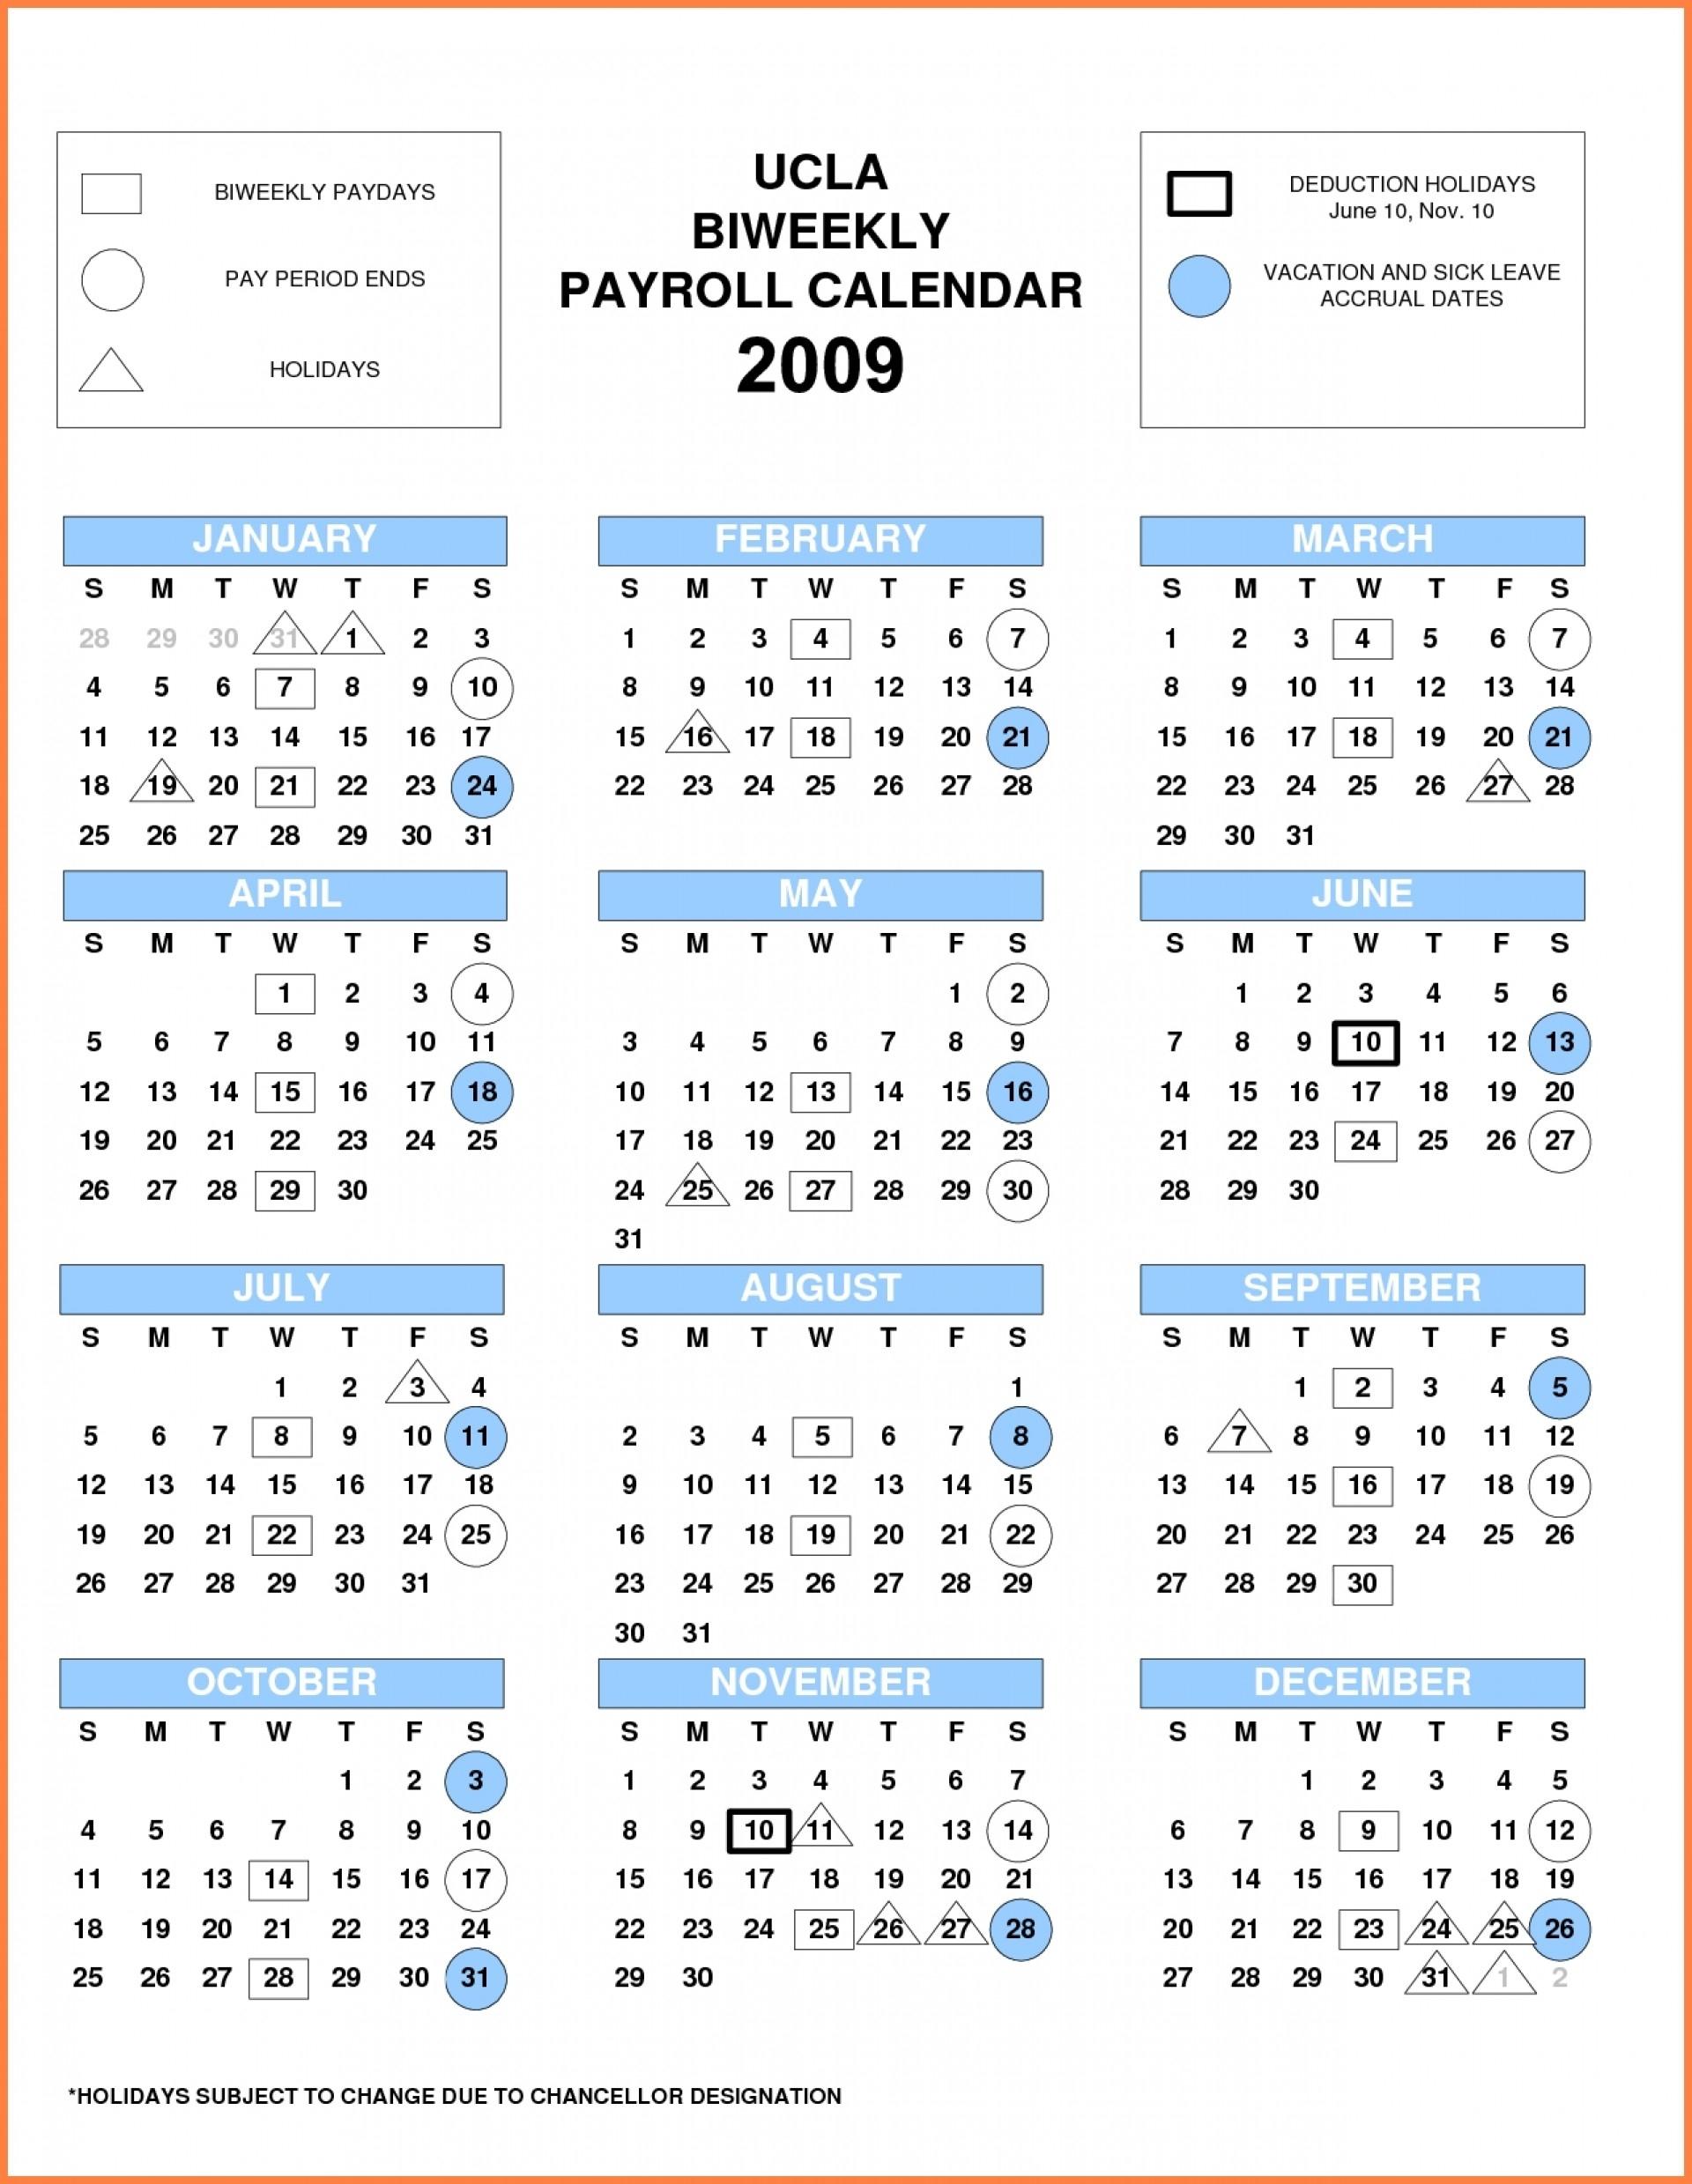 2020 Biweekly Payroll Calendar Printable   Payroll Calendar 2020 with 2020 Federal Pay Period Calendar Printable